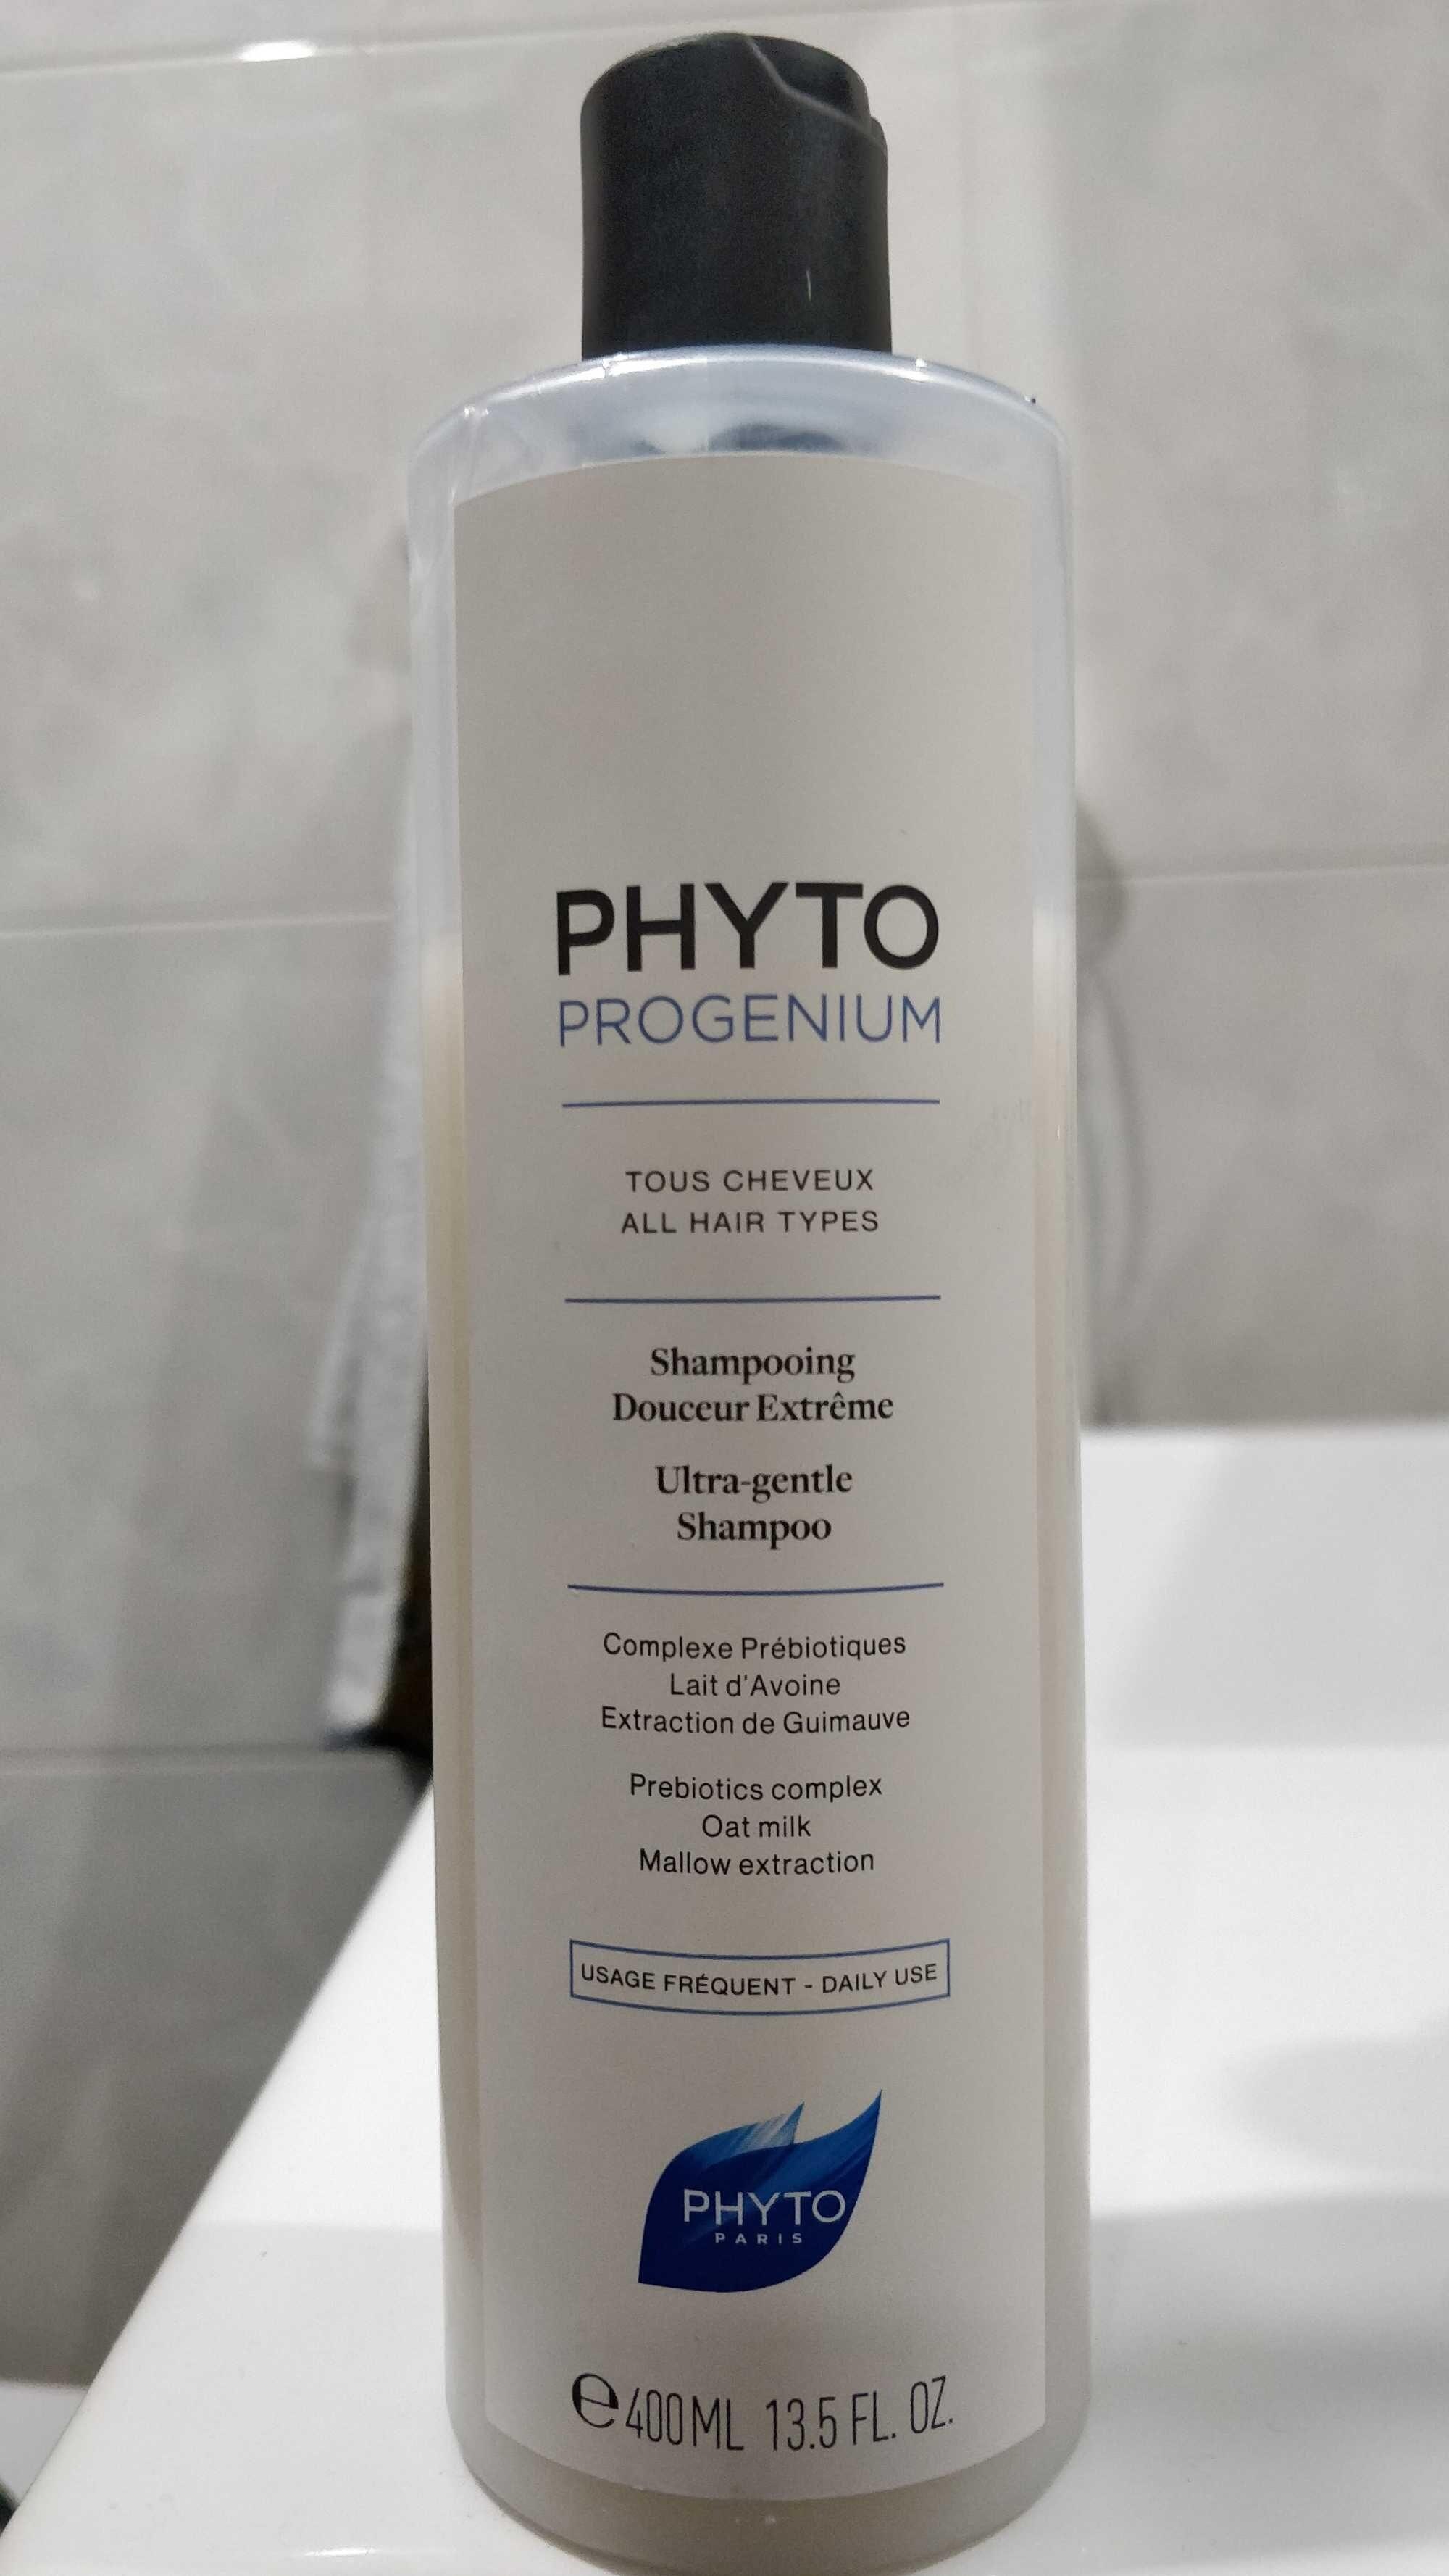 Phyto Progenium - Product - pt